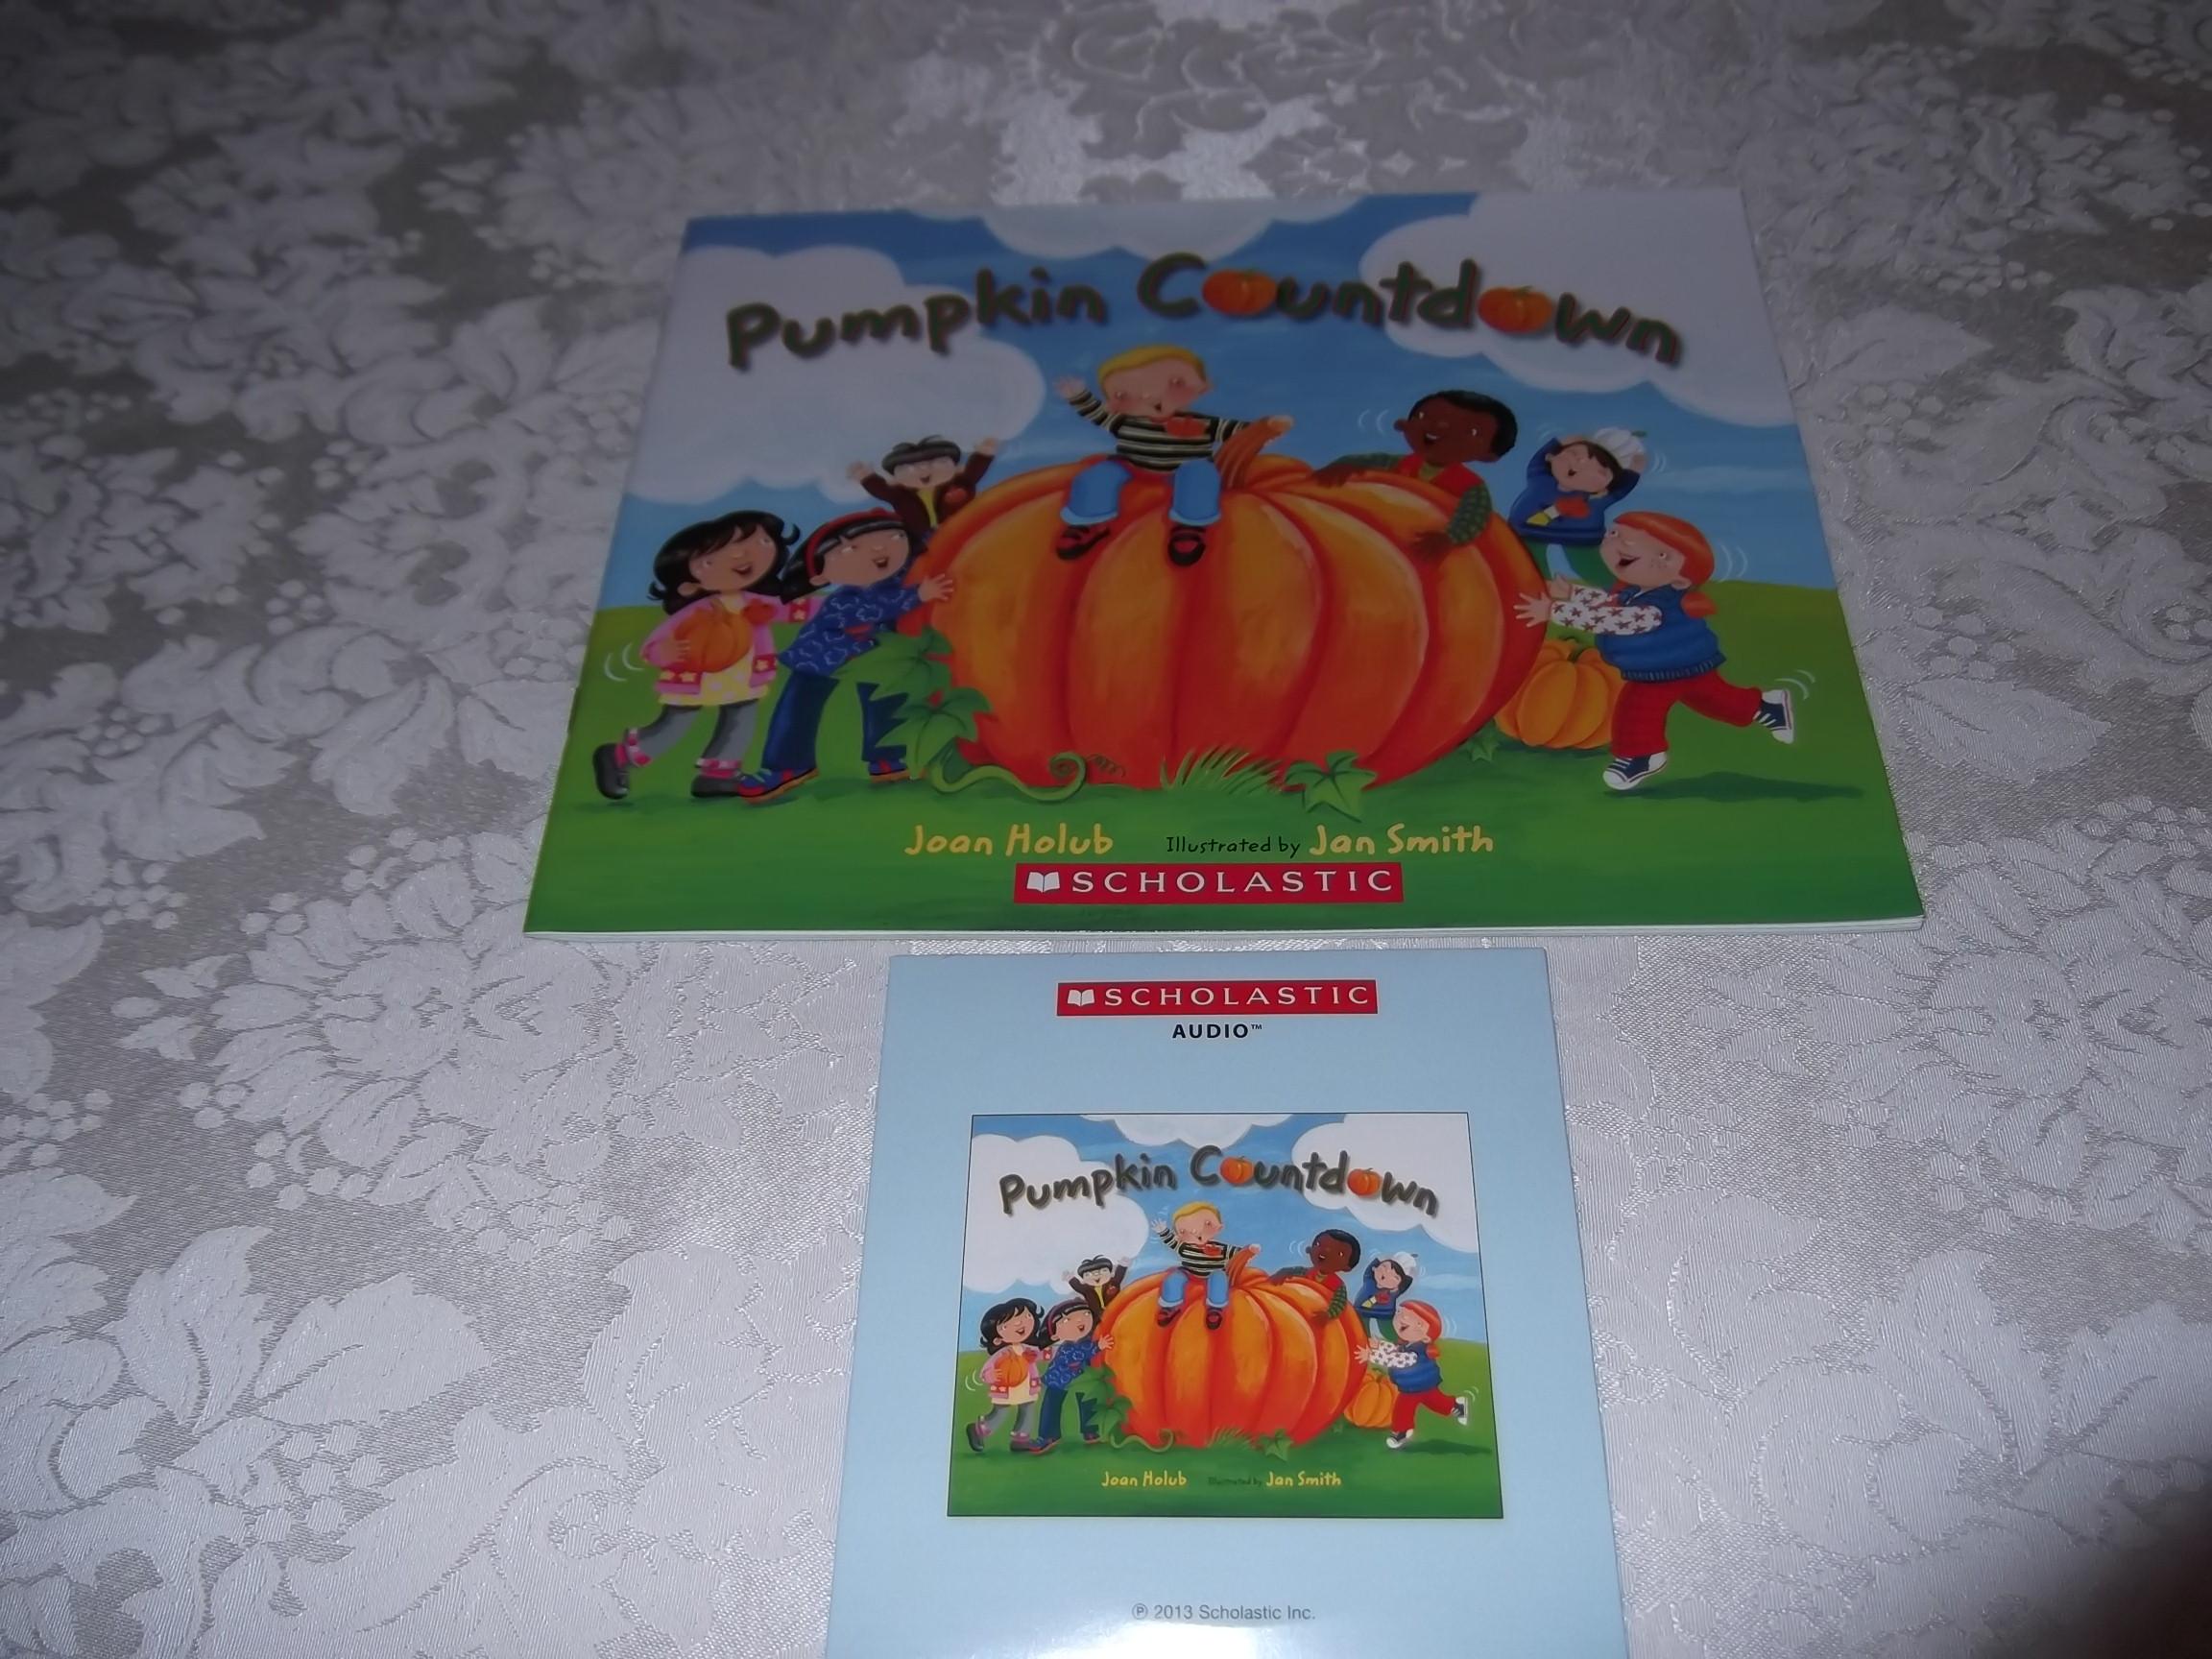 Pumpkin Countdown Joan Holub Audio CD & SC Set Brand New